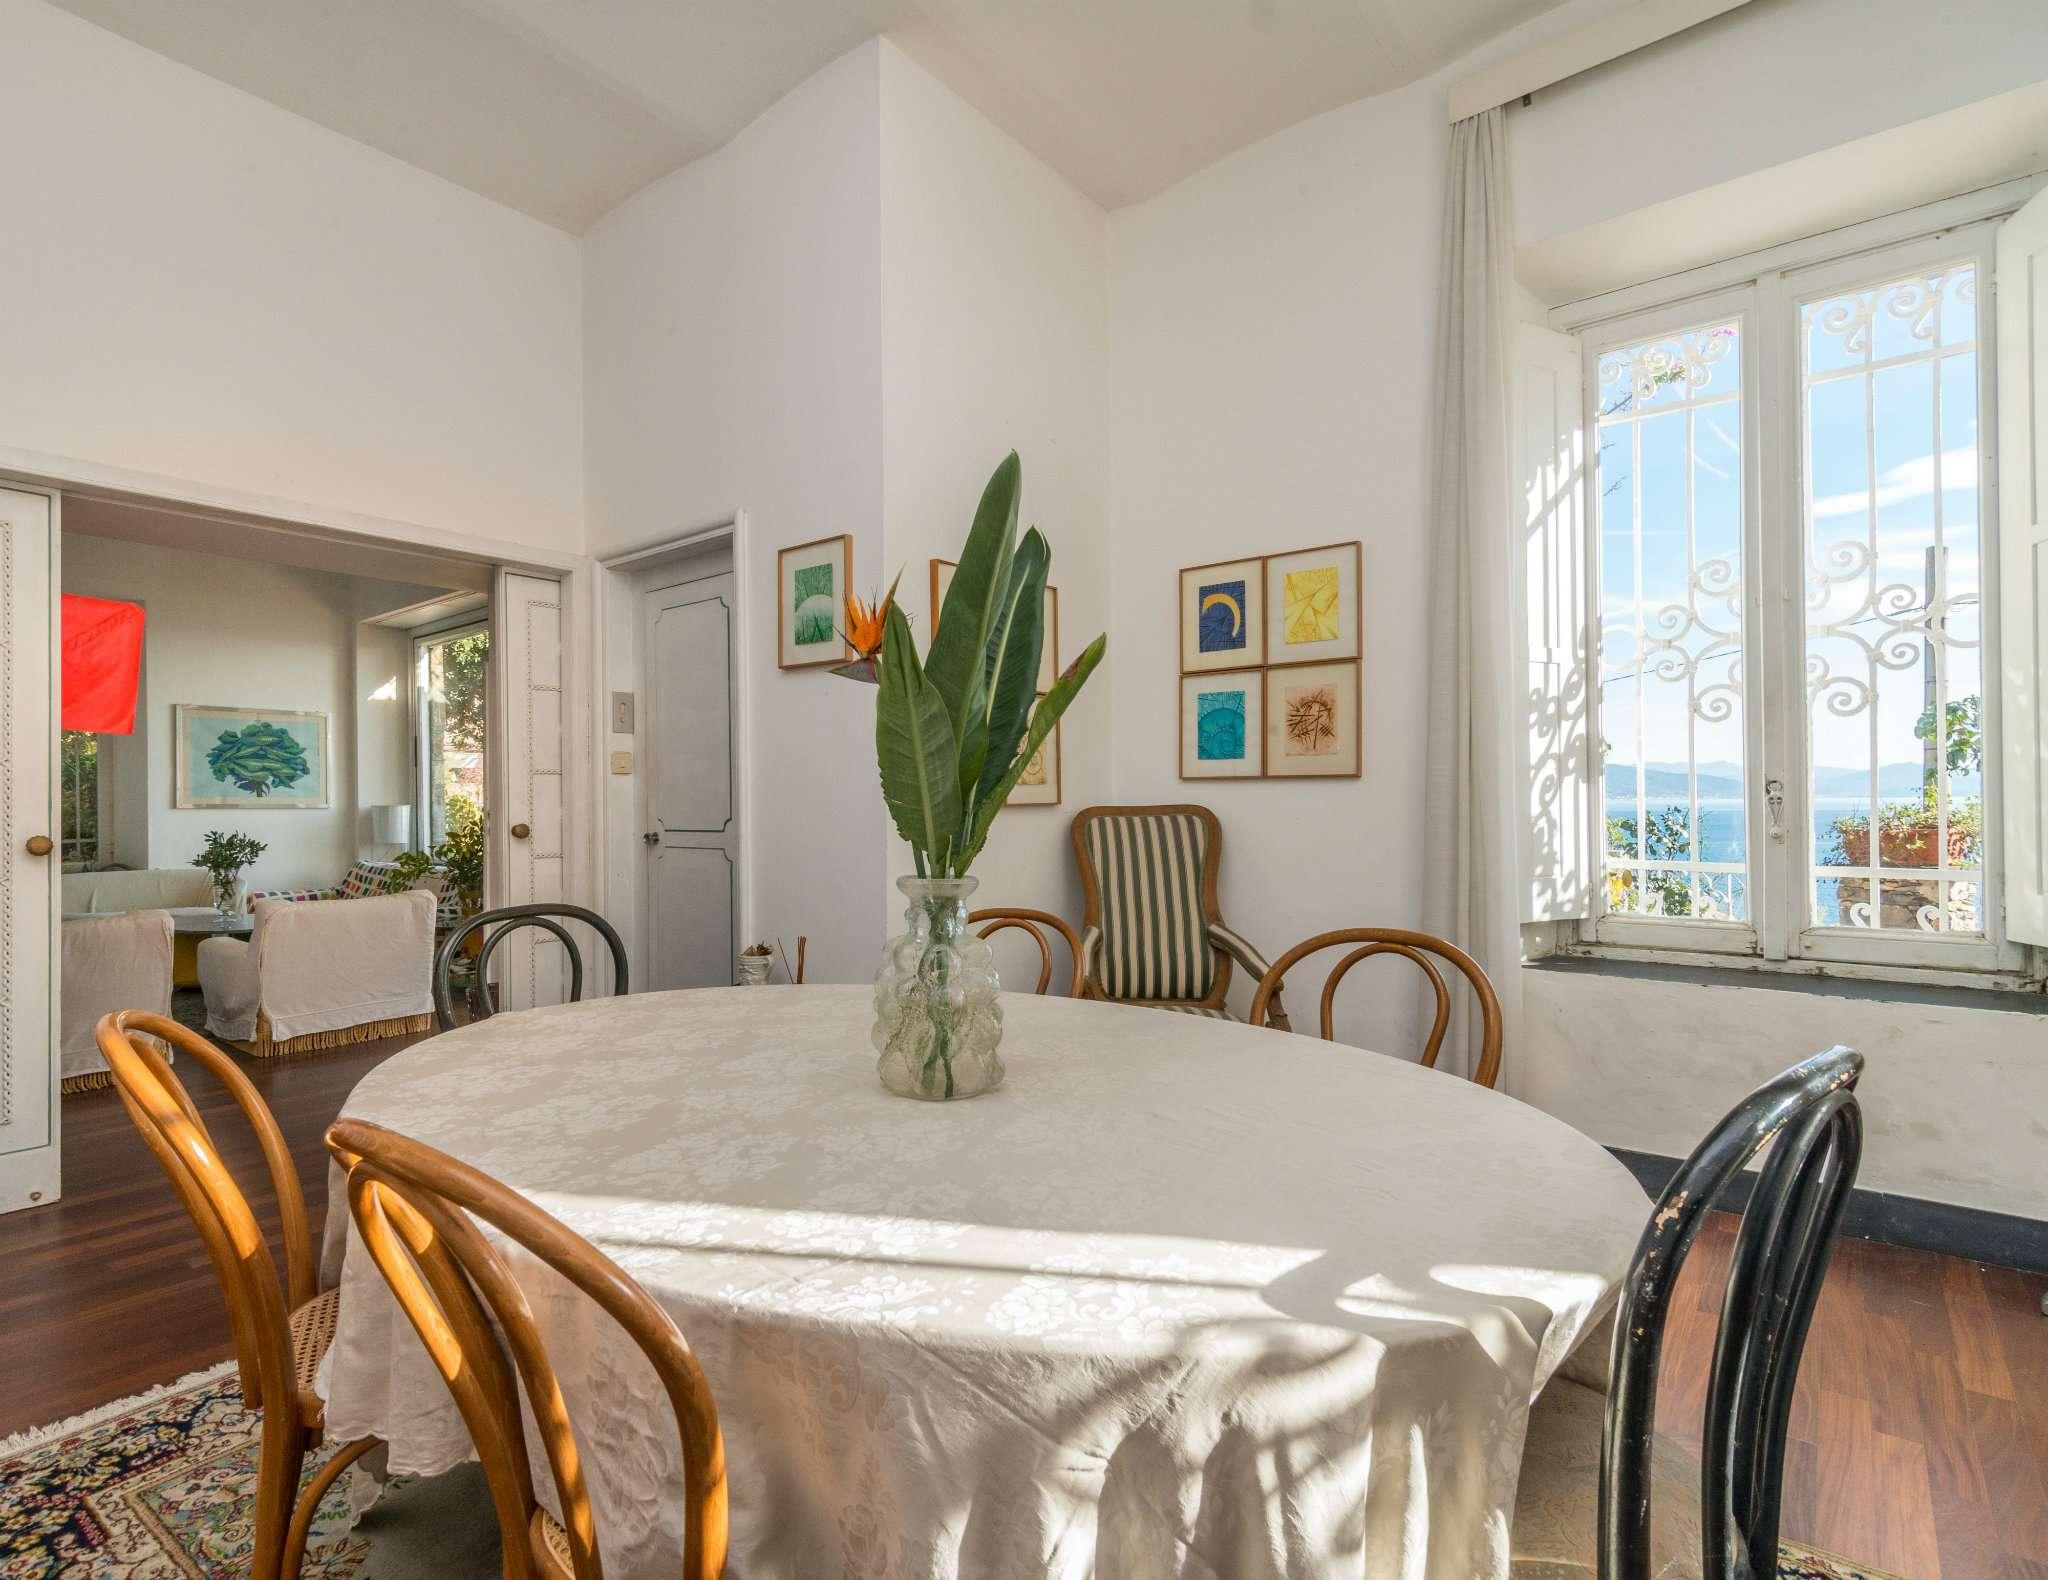 Villa in Vendita a Santa Margherita Ligure: 5 locali, 545 mq - Foto 4